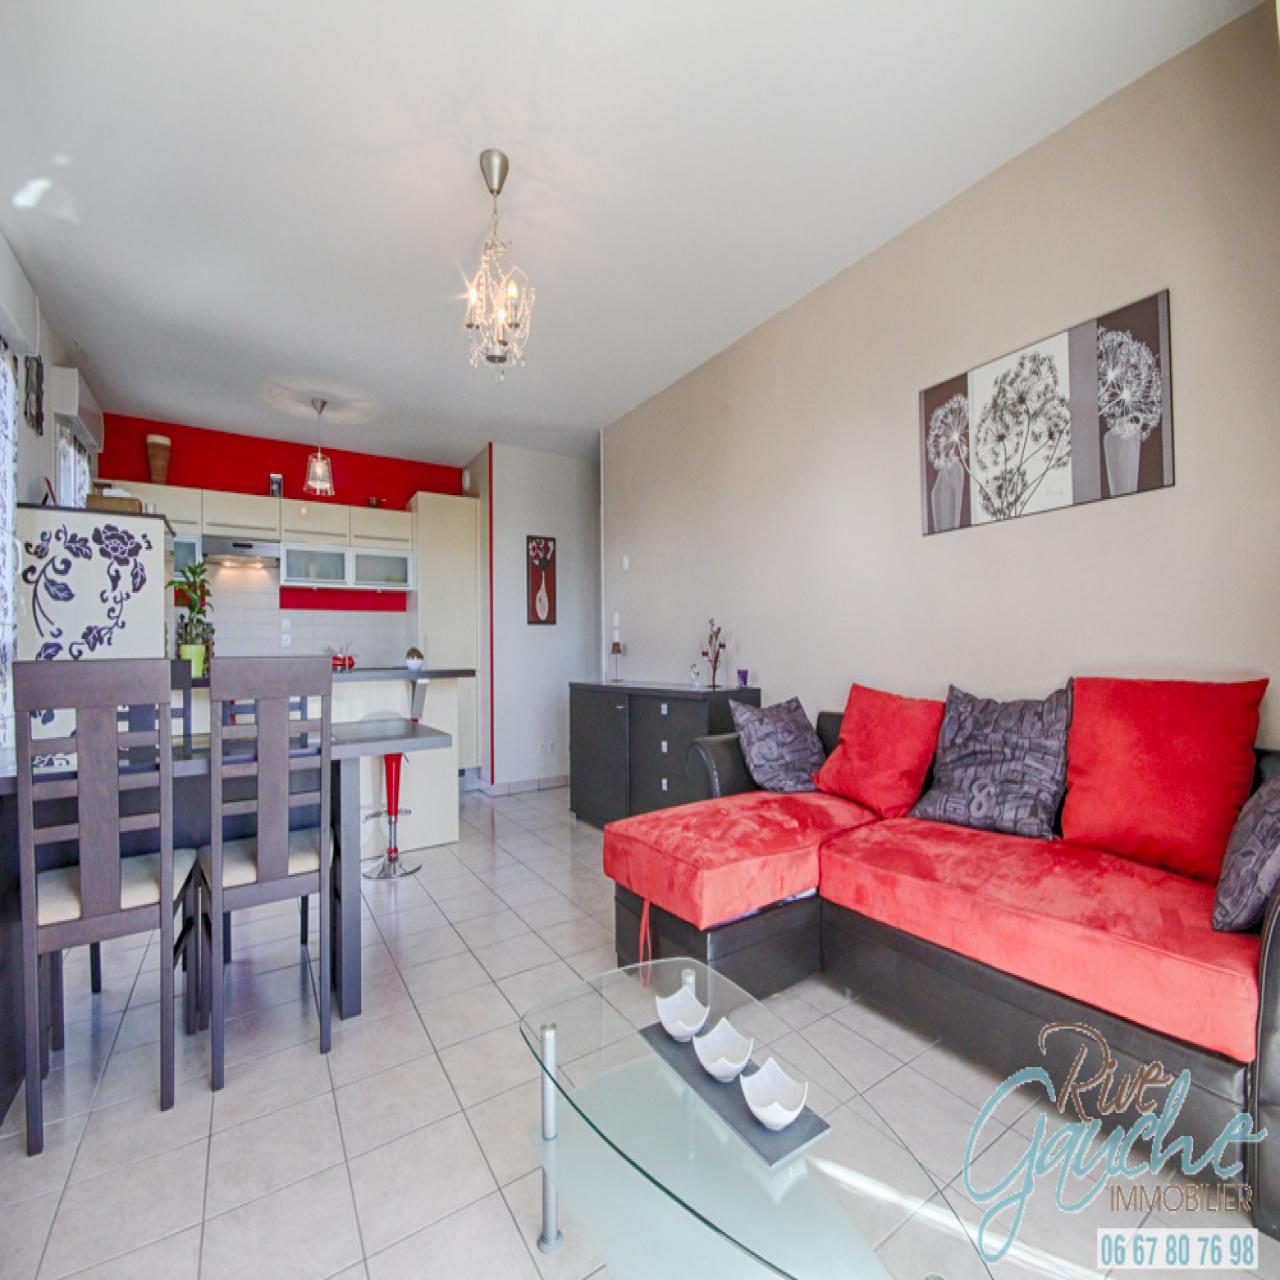 Image_1, Appartement, Villaz, ref :FI3042